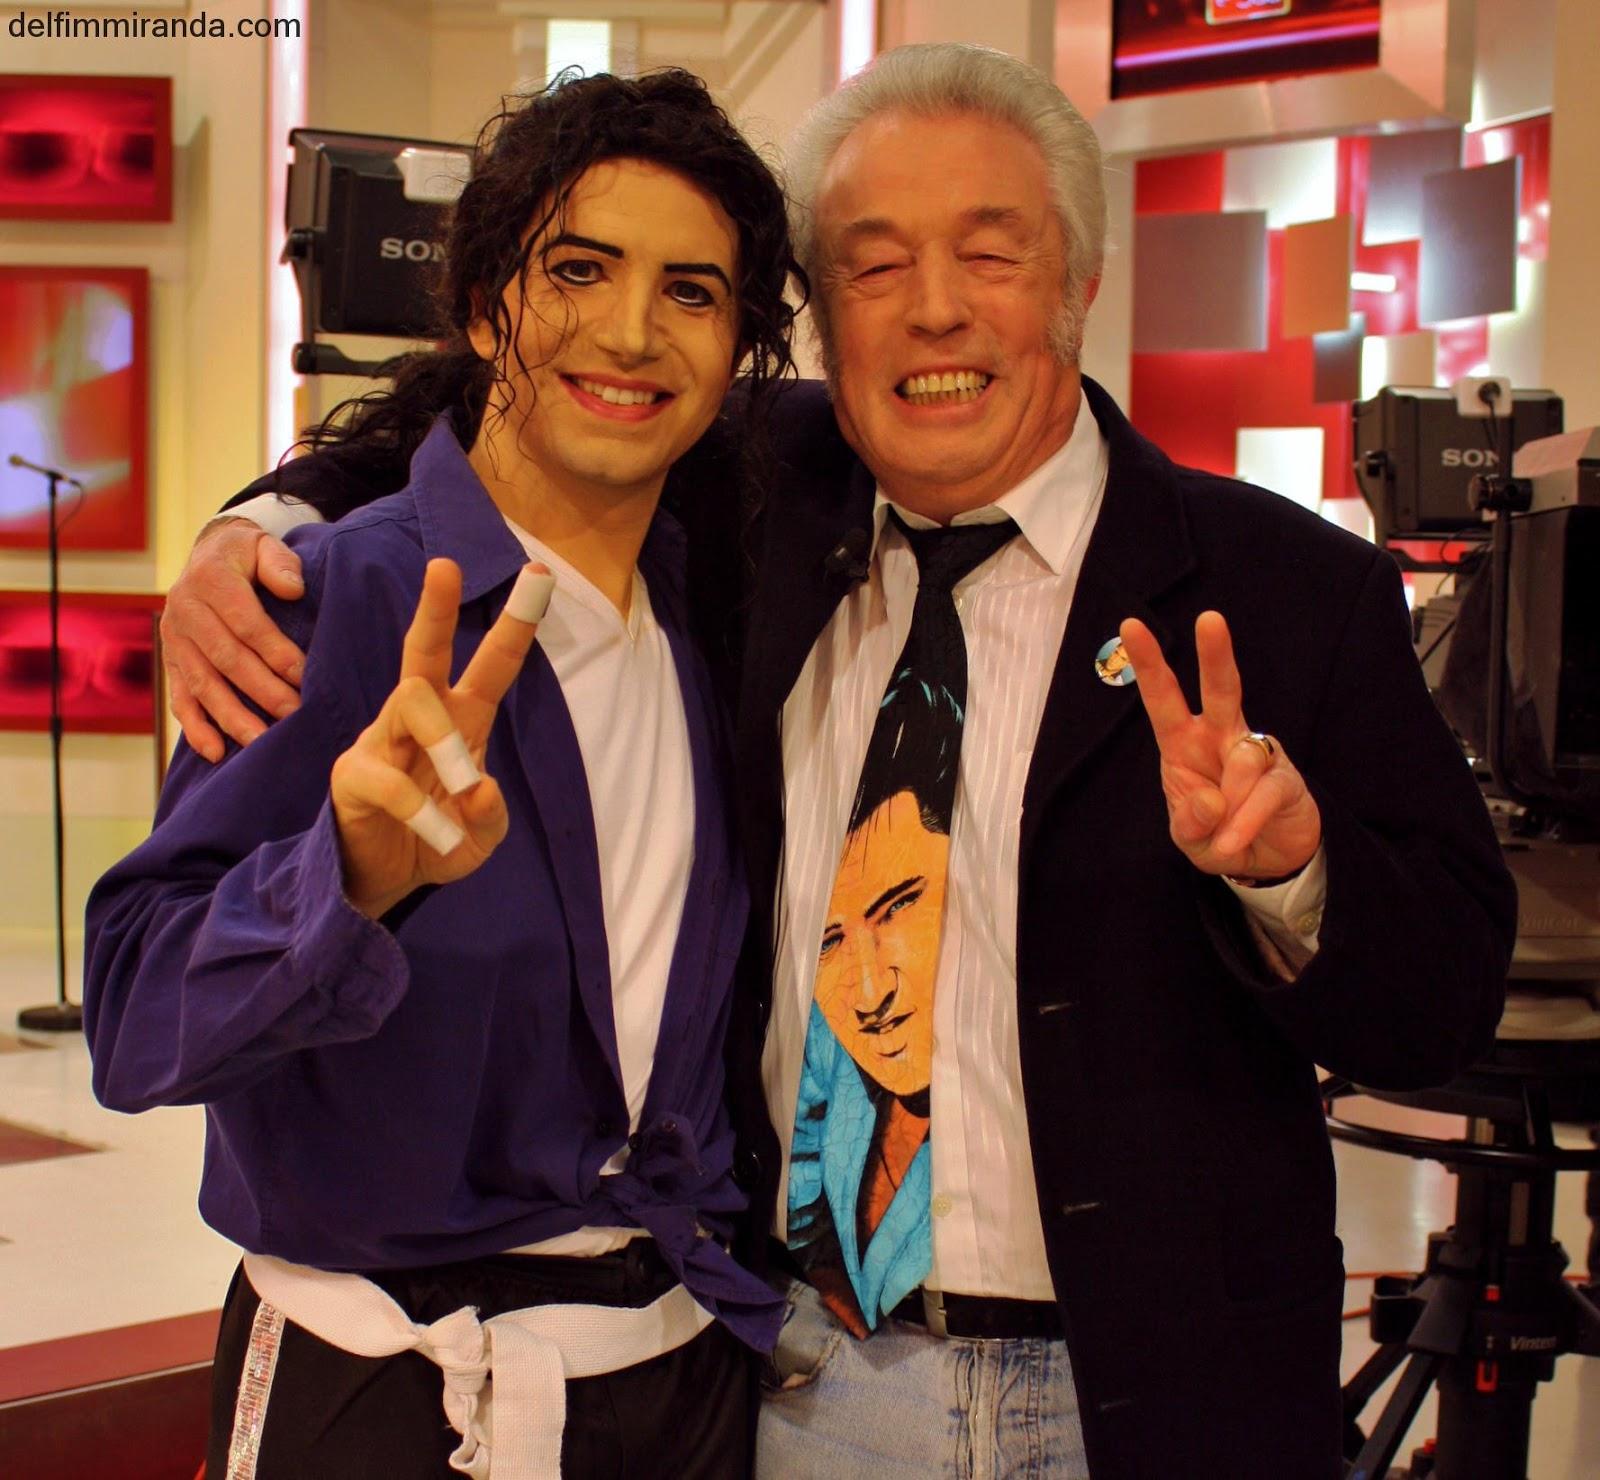 Delfim Miranda - Michael Jackson Tribute - With Elvis Fan